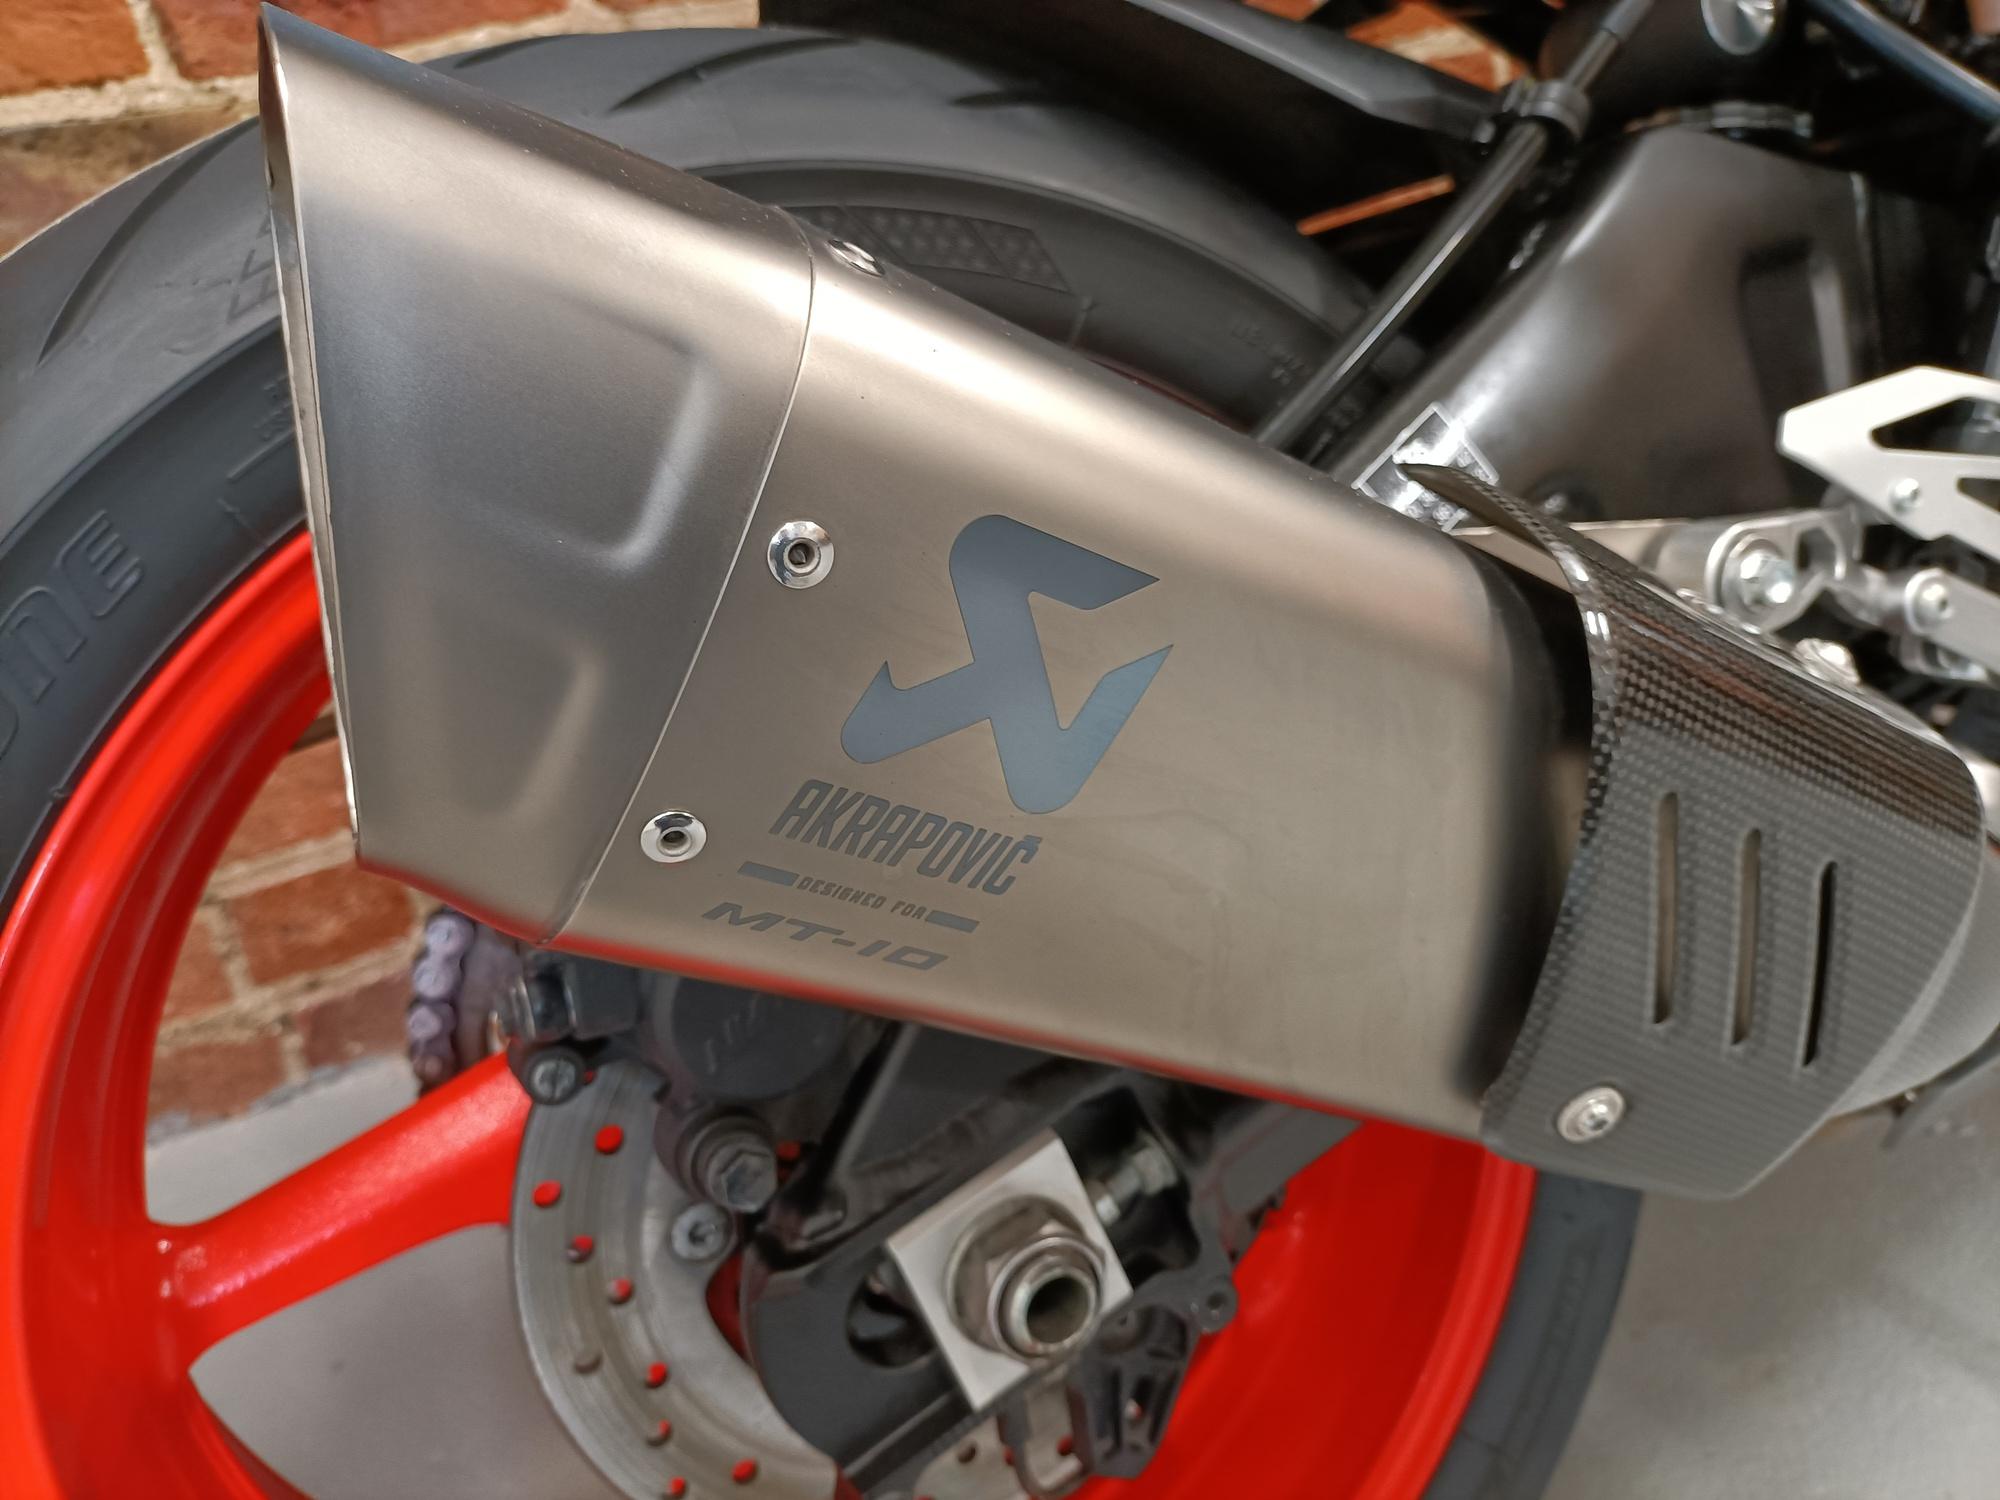 2019 YAMAHA MT-10 MTN 1000 AKRAPOVIC EXHAUST COMFORT SEAT